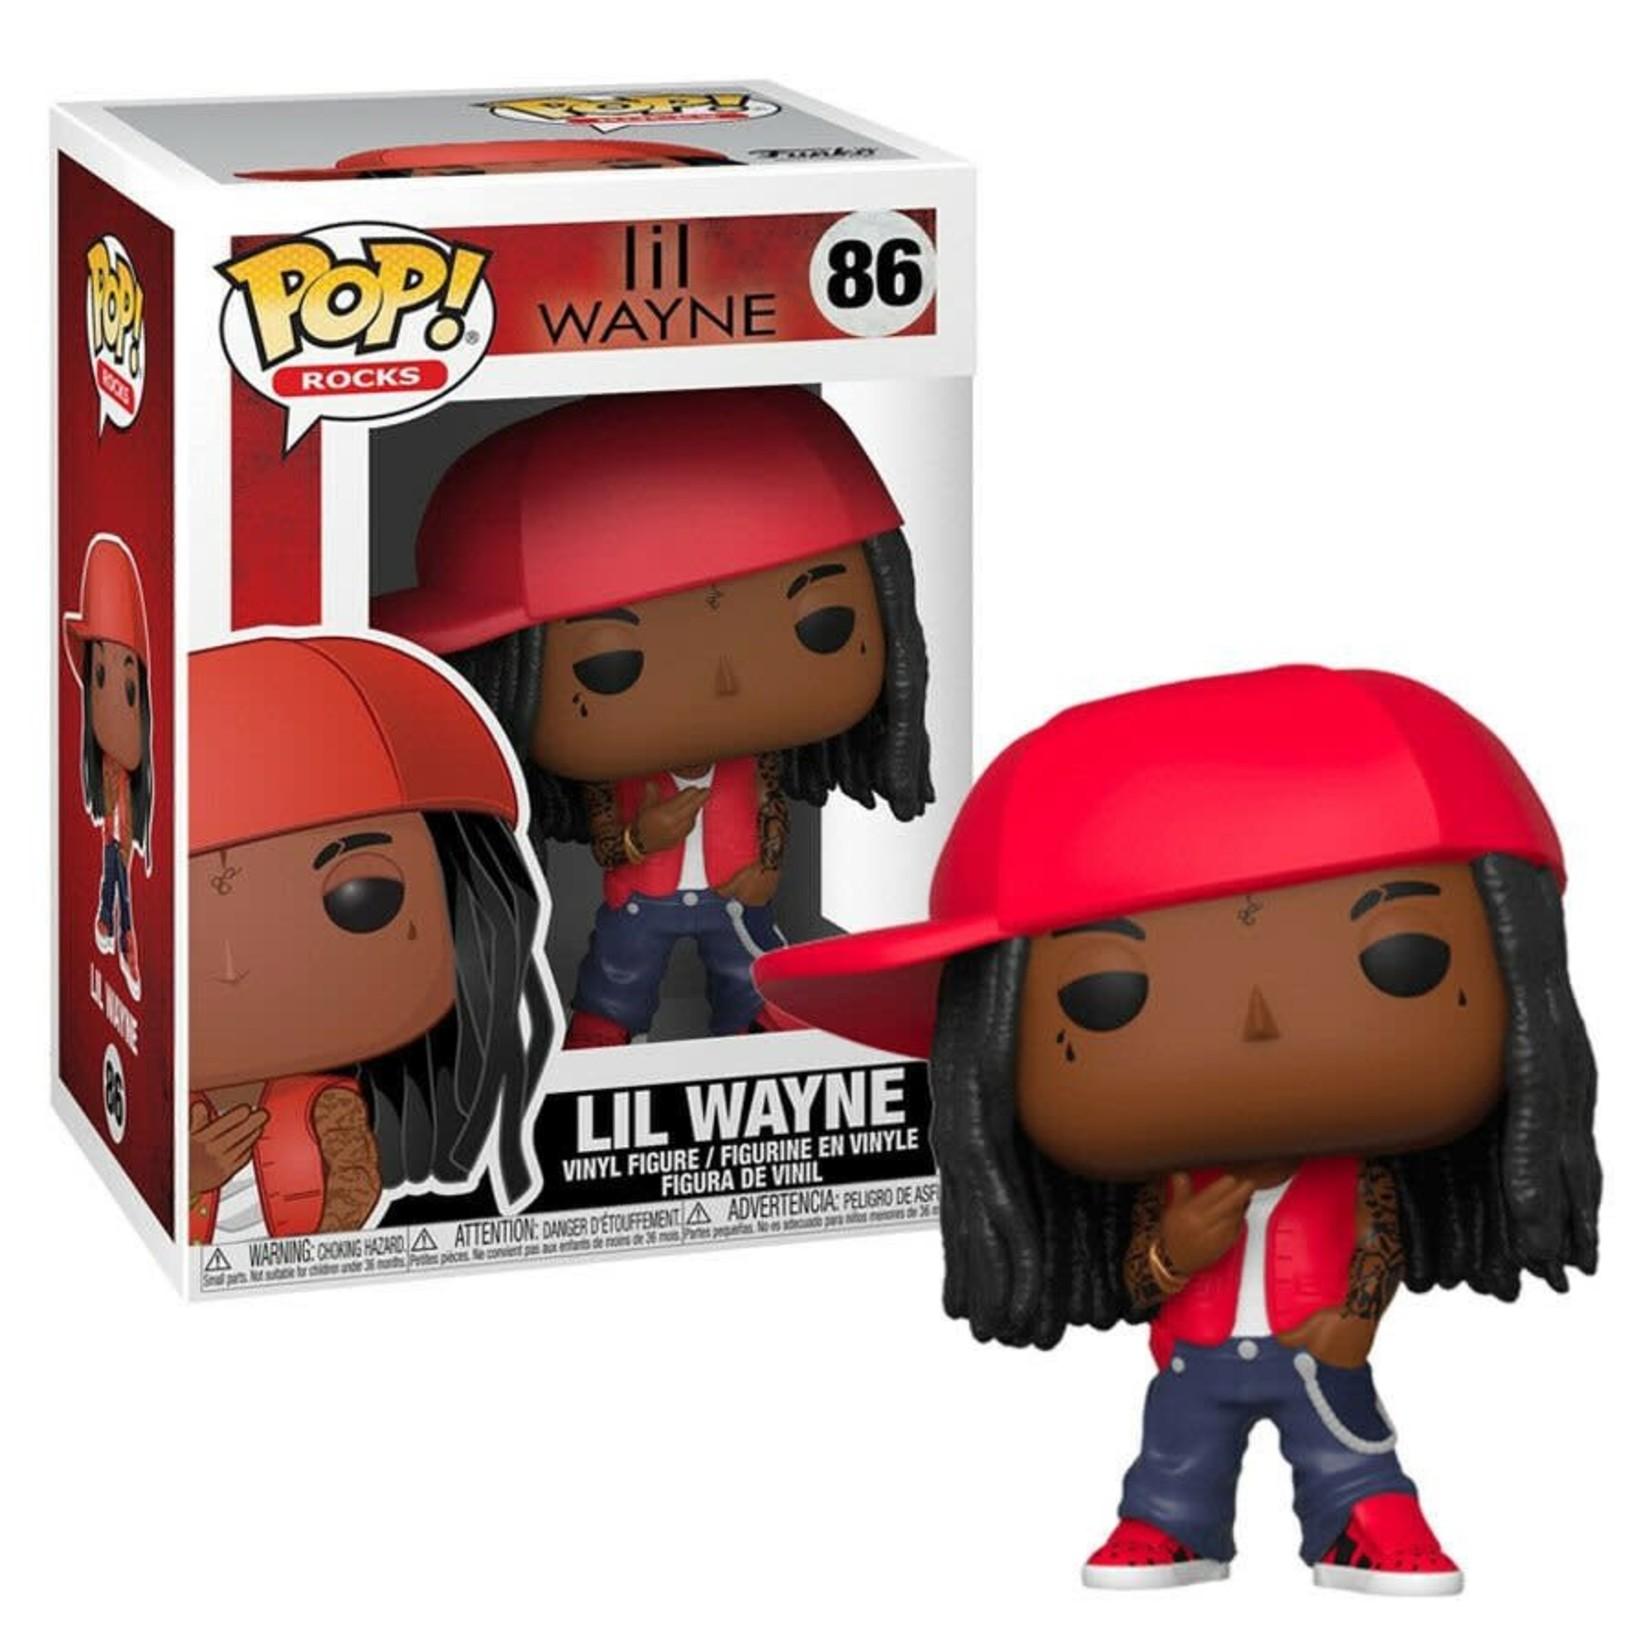 LiL Wayne POP! Rocks Vinyl Figure LiL Wayne 9 cm nr 86